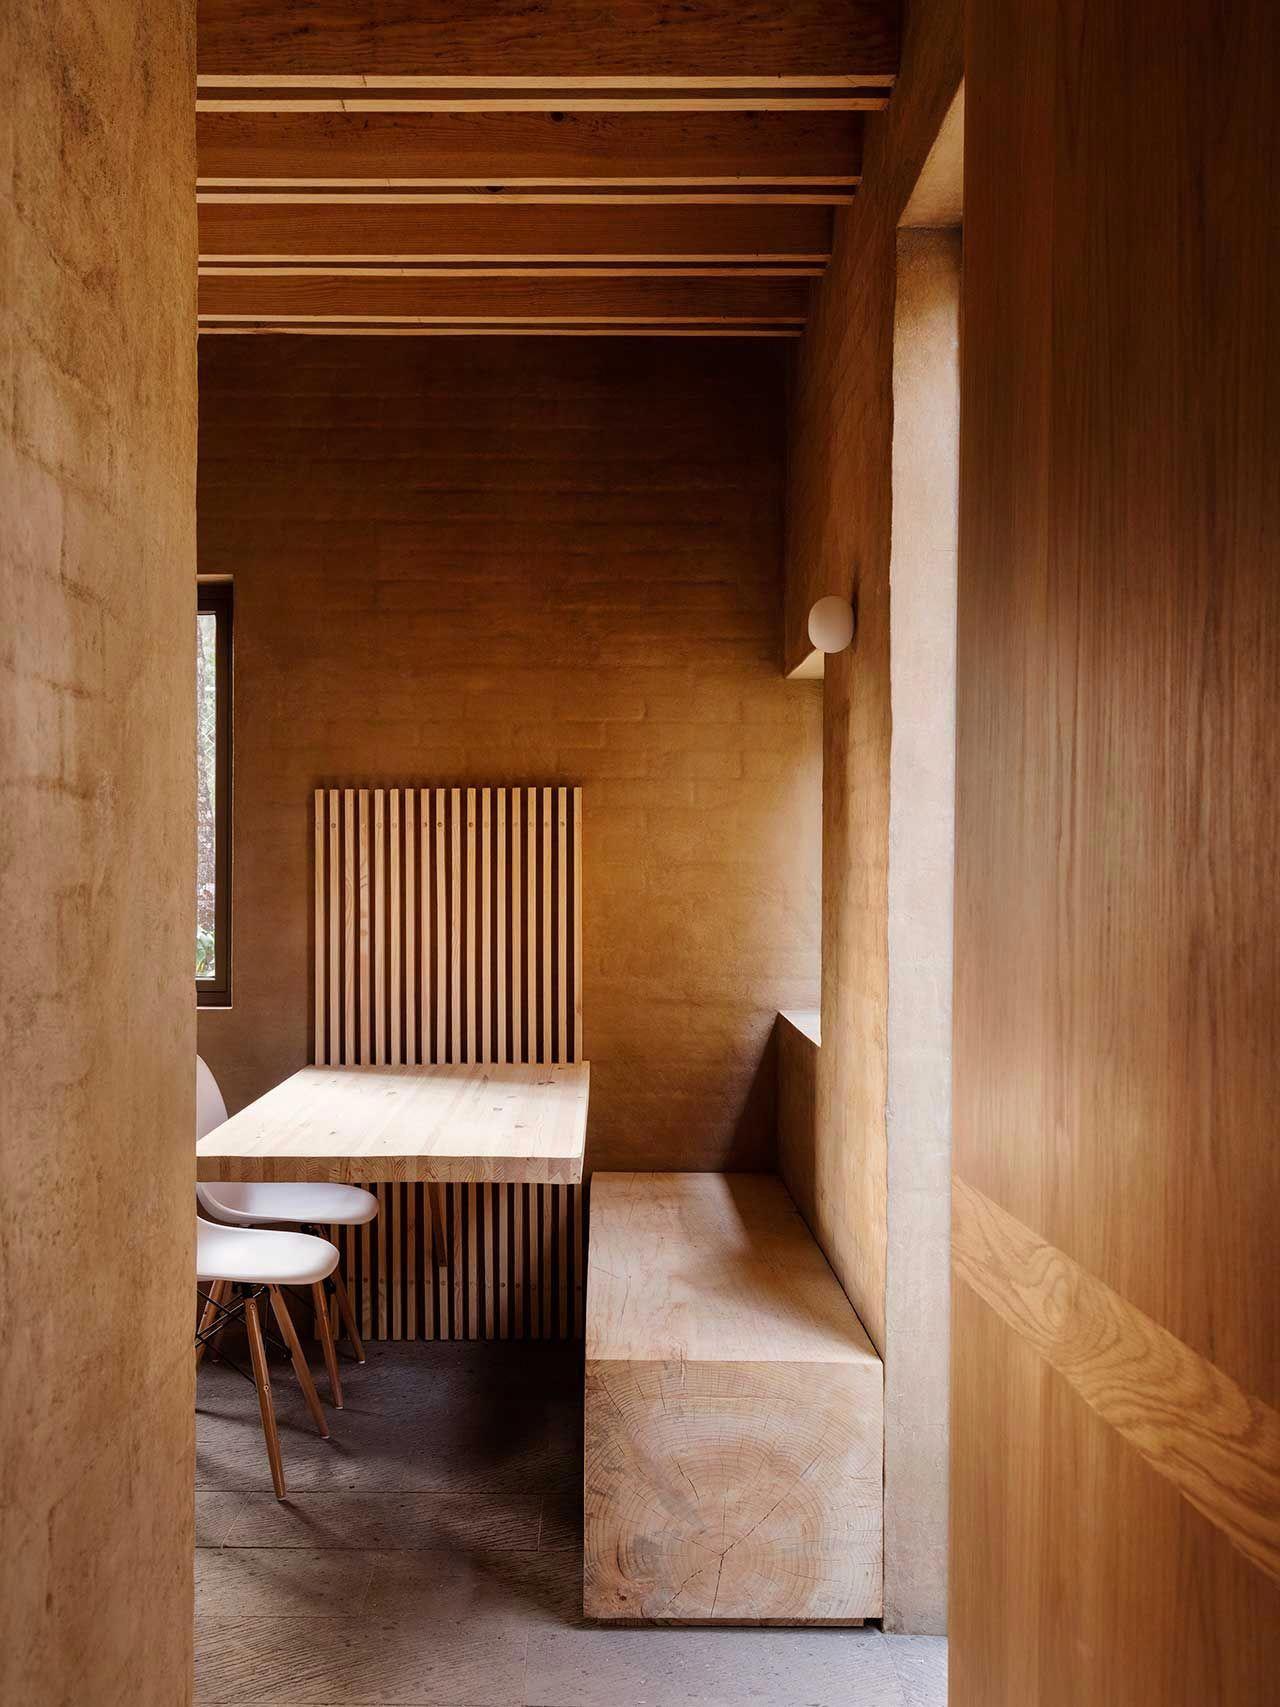 Photo rory gardiner sweet home make interior decoration design ideas decor styles scandinavian also rh pinterest